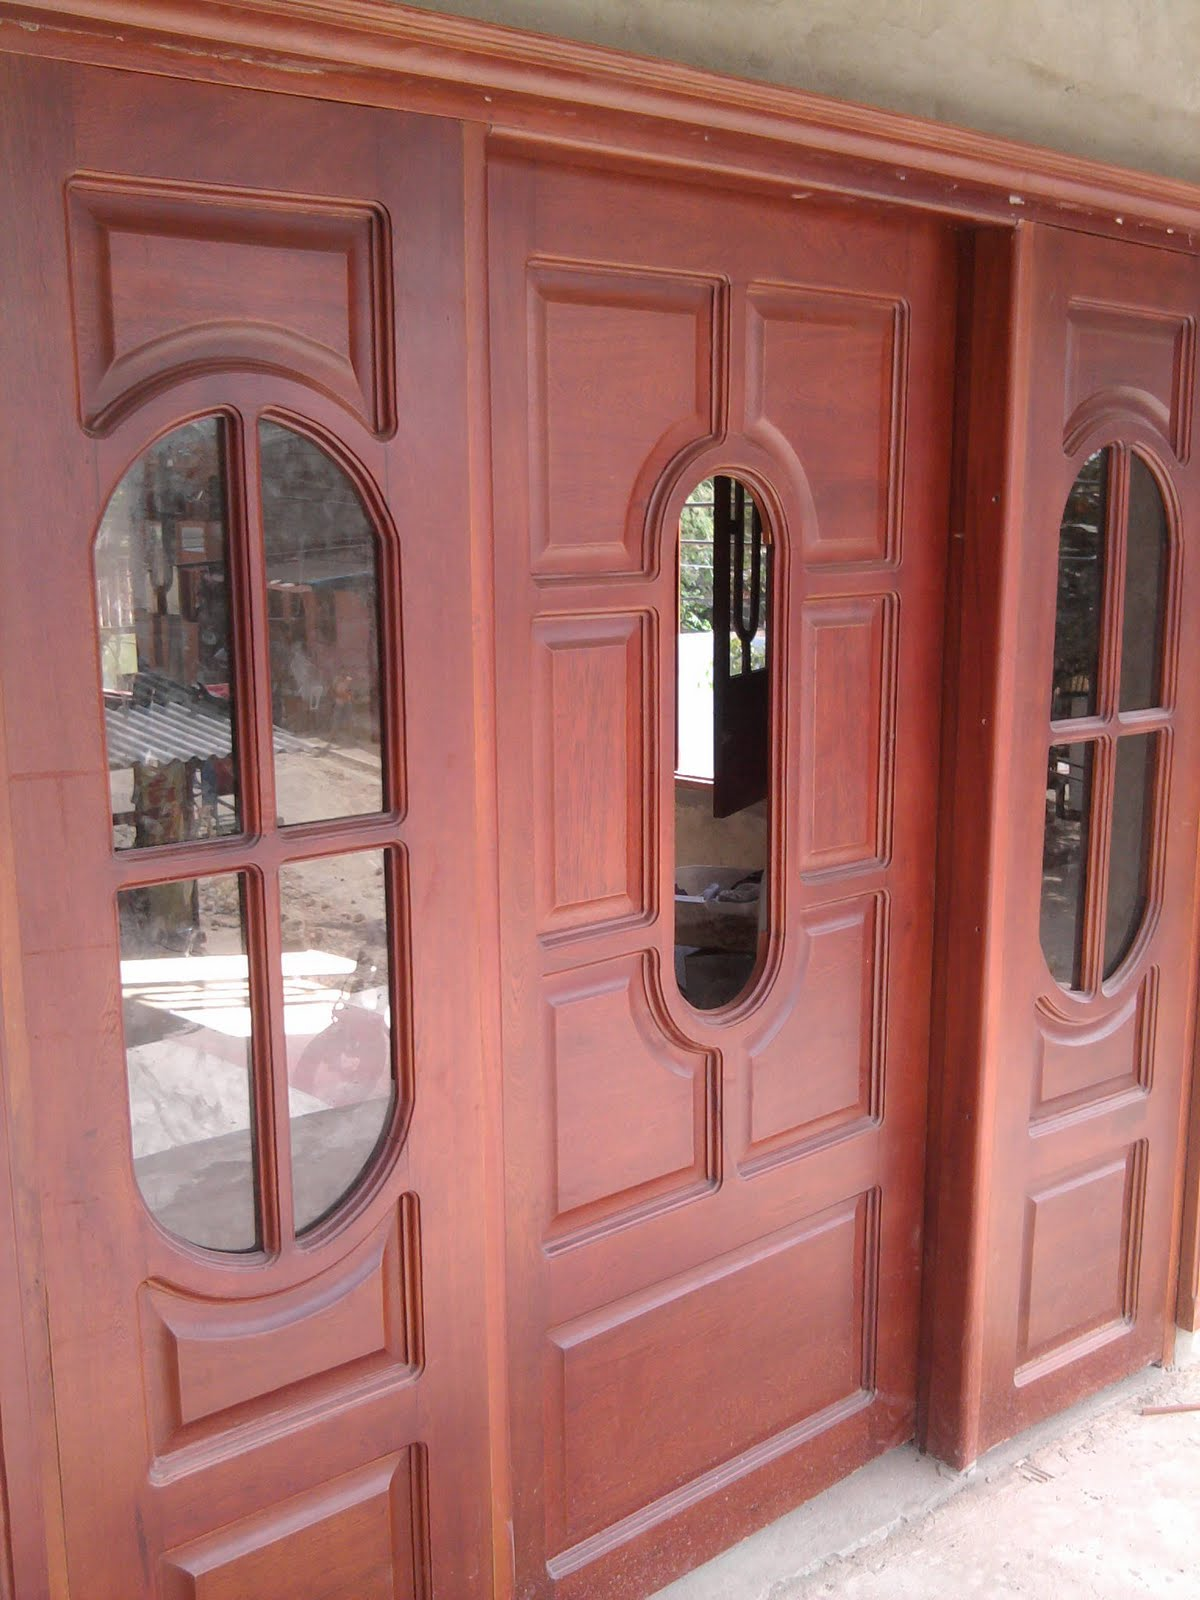 Muebles reinel carpenter puertas principales for Puertas principales de madera